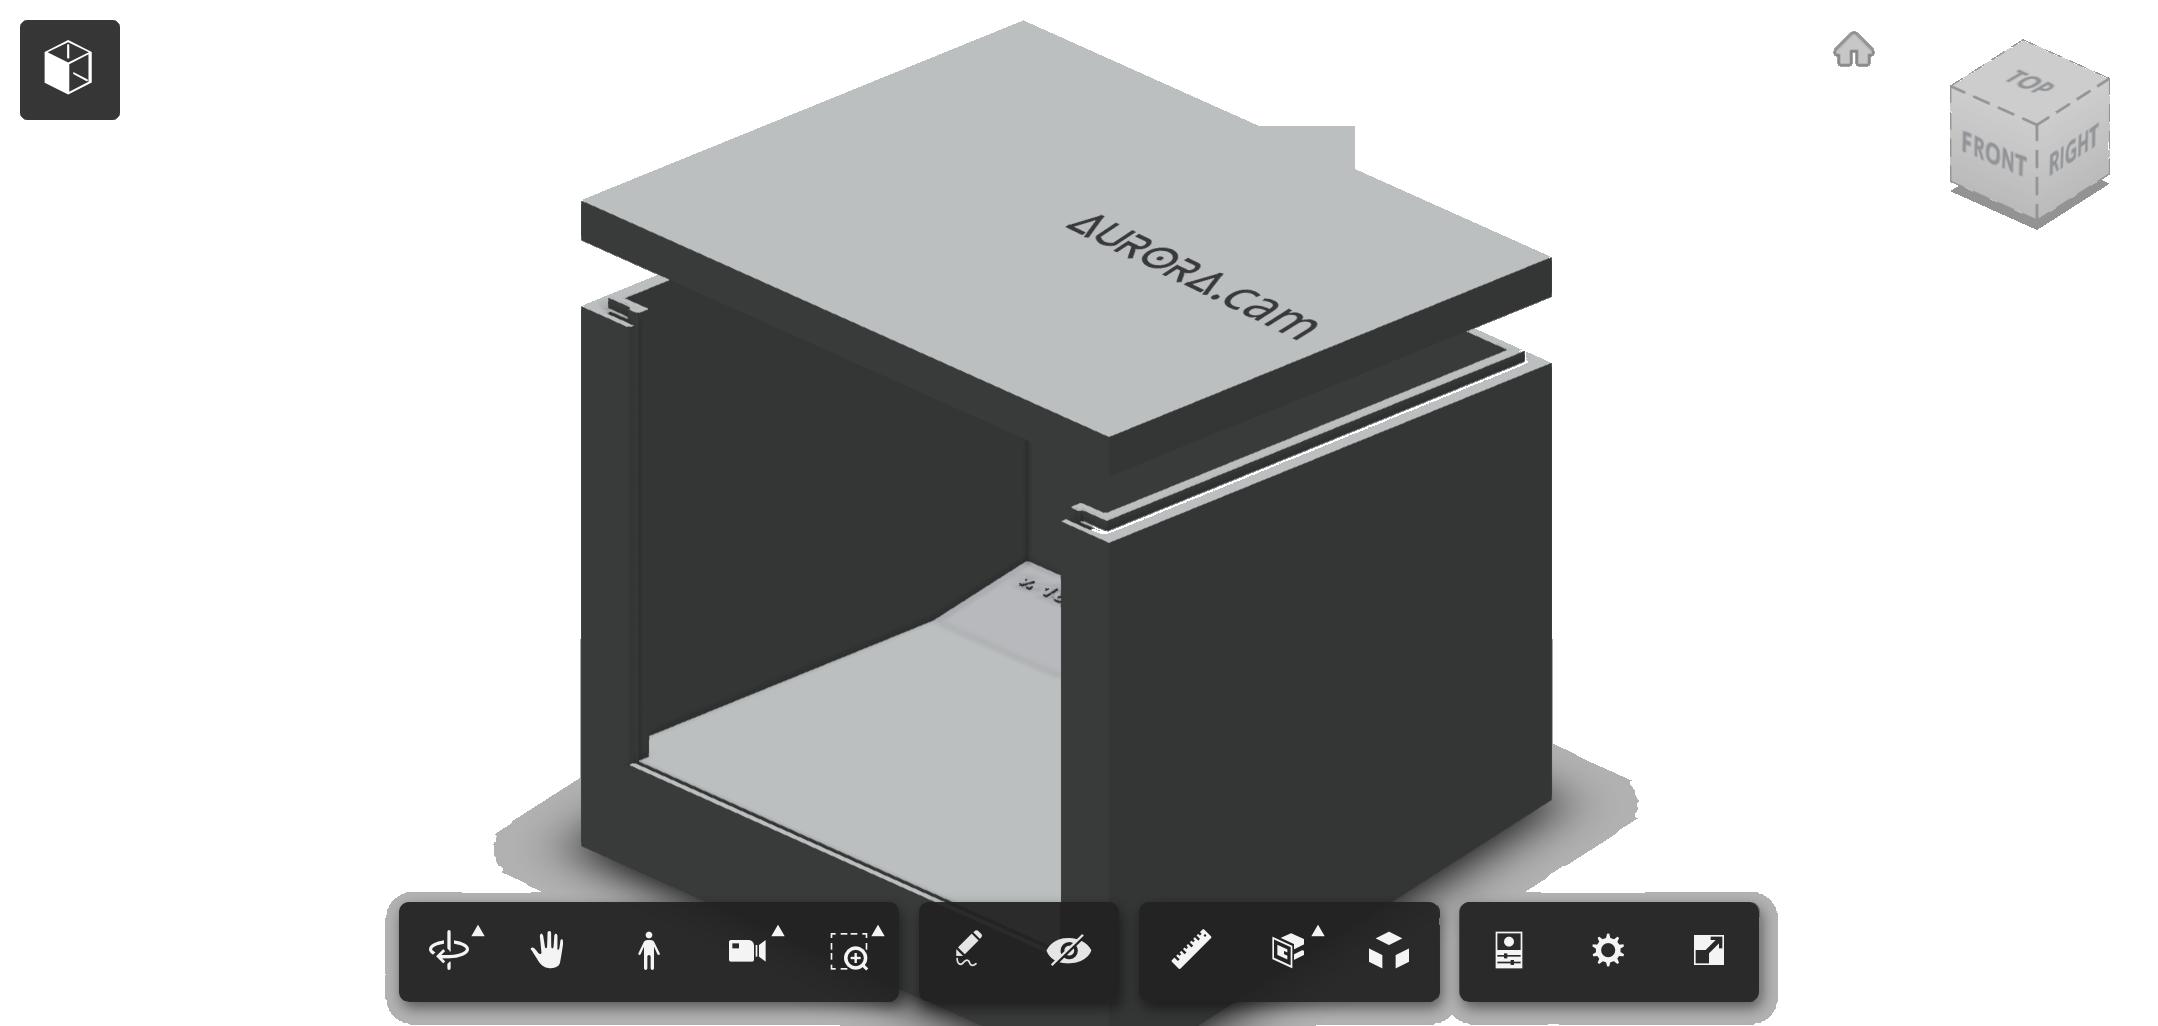 autodesk360 3d weatherproof camera box